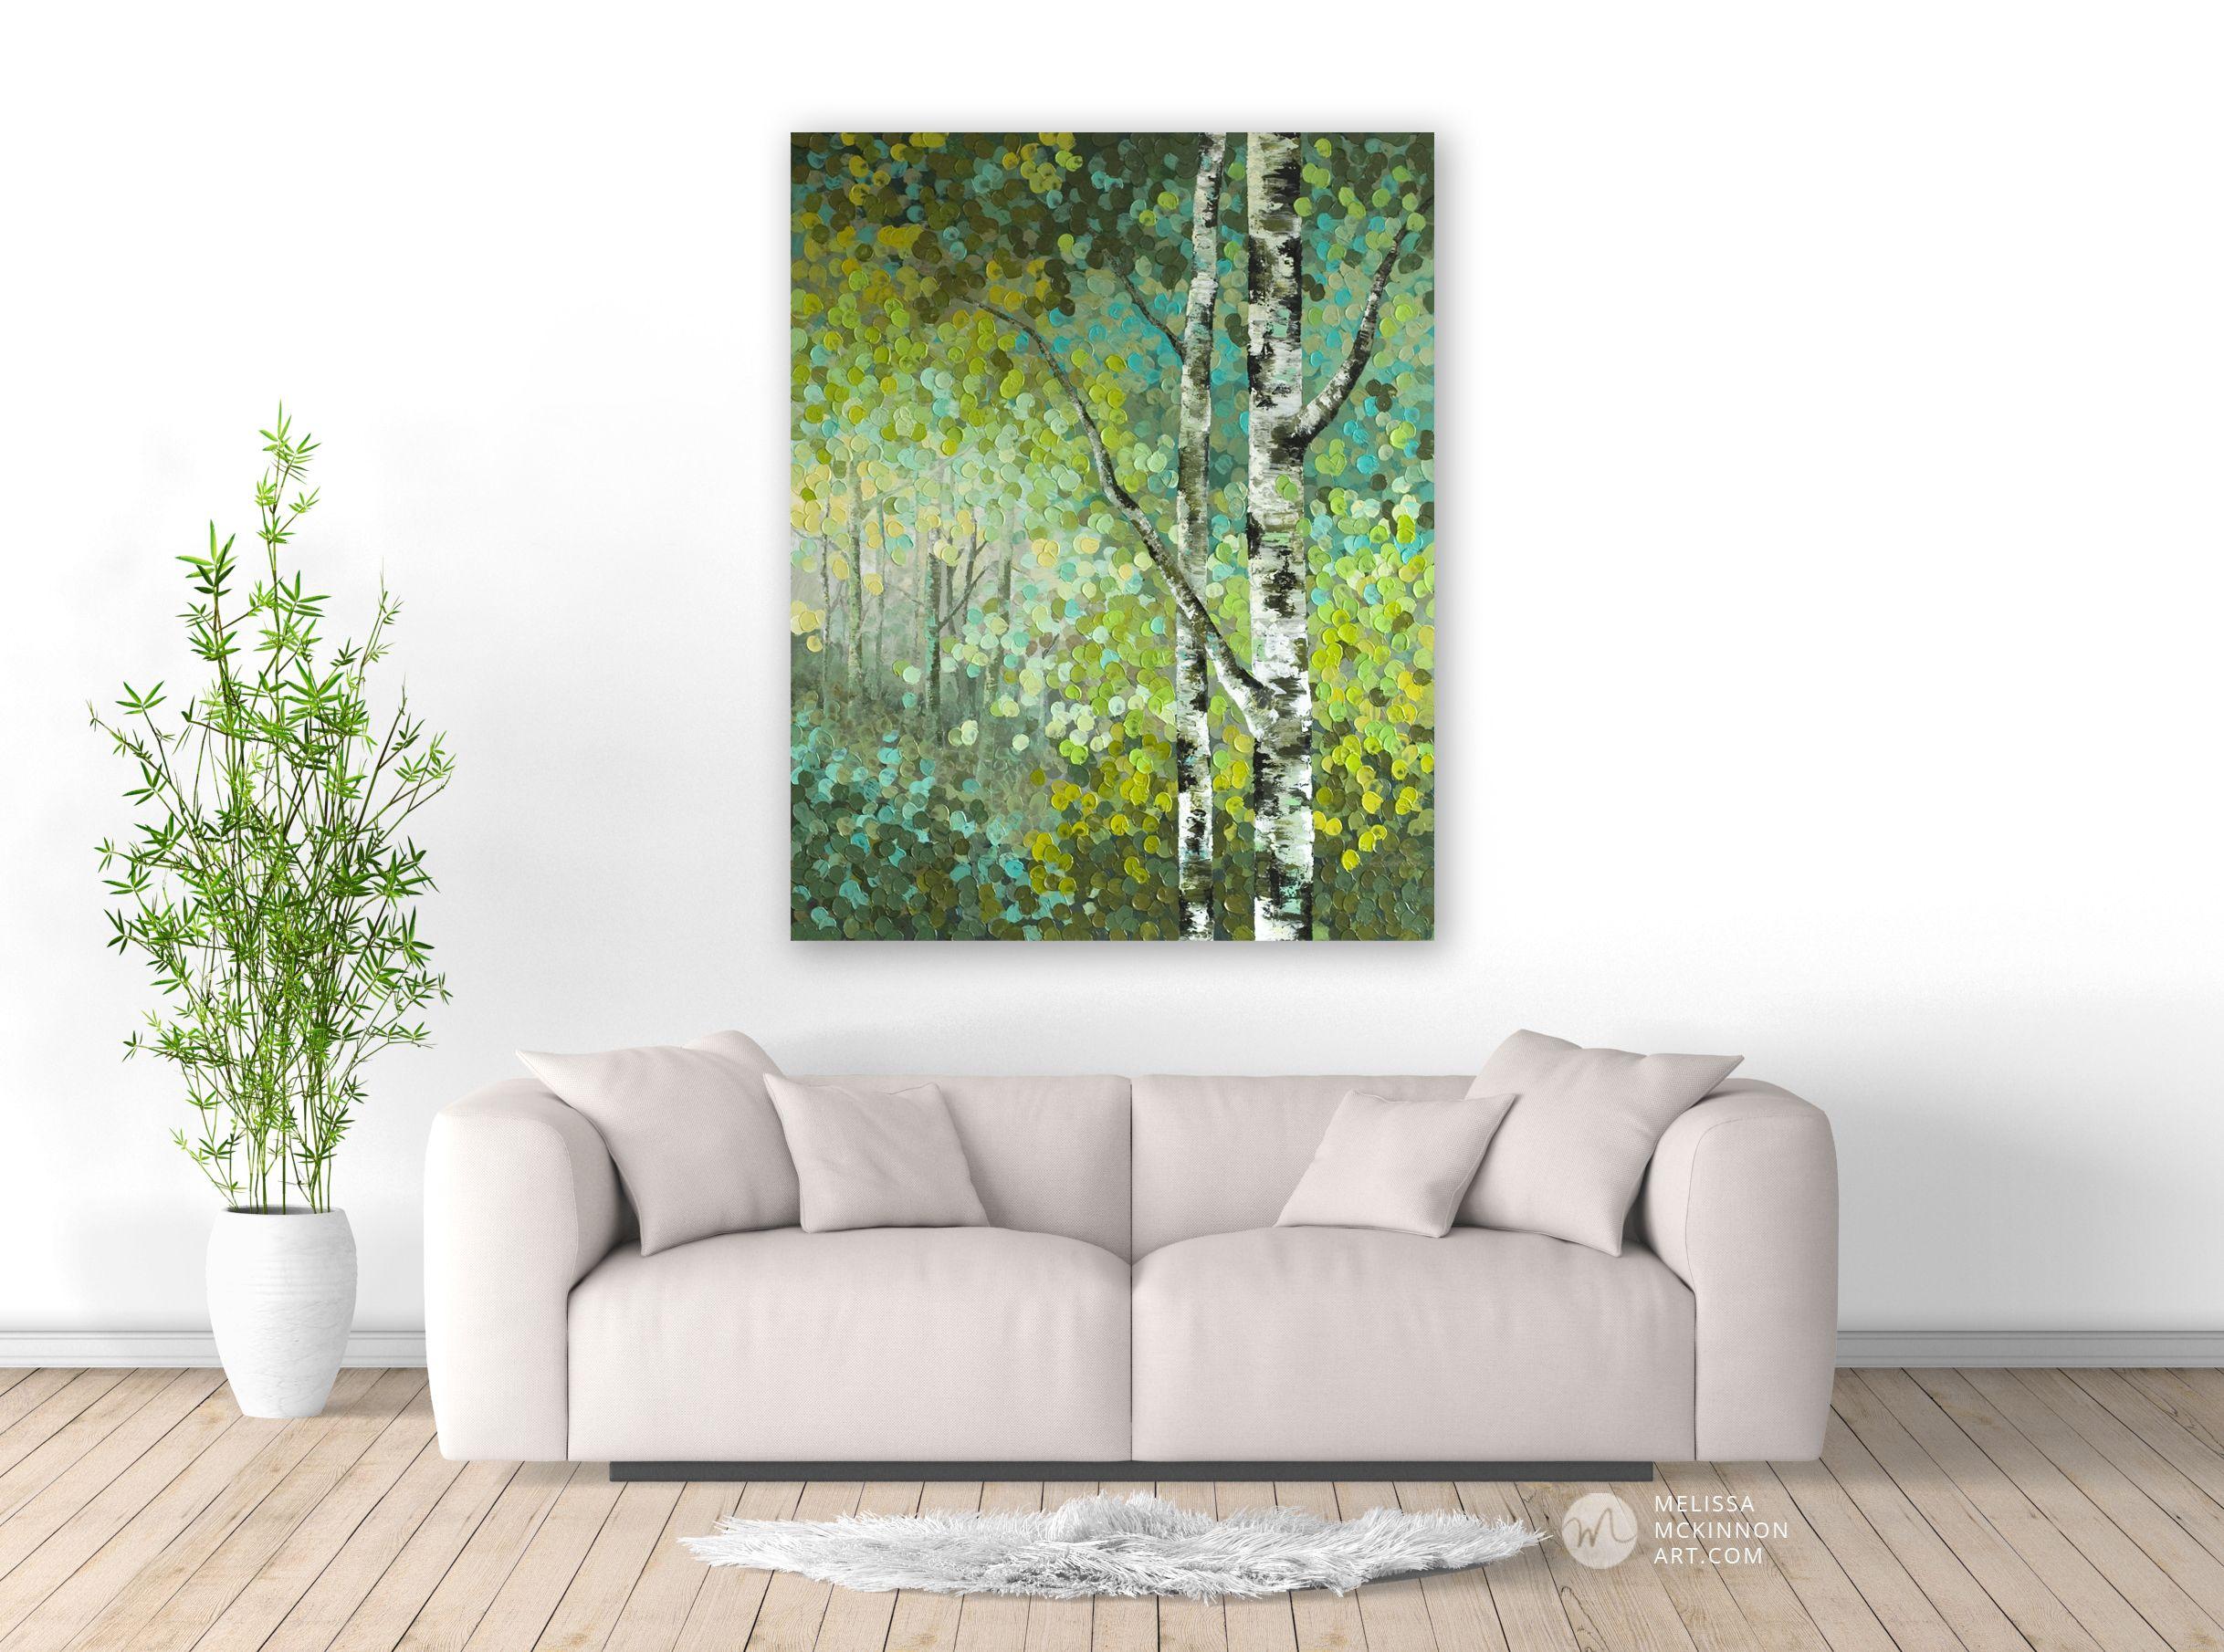 Melissa Mckinnon Art Colourful Lush Green, Aqua, Yellow And Turquoise